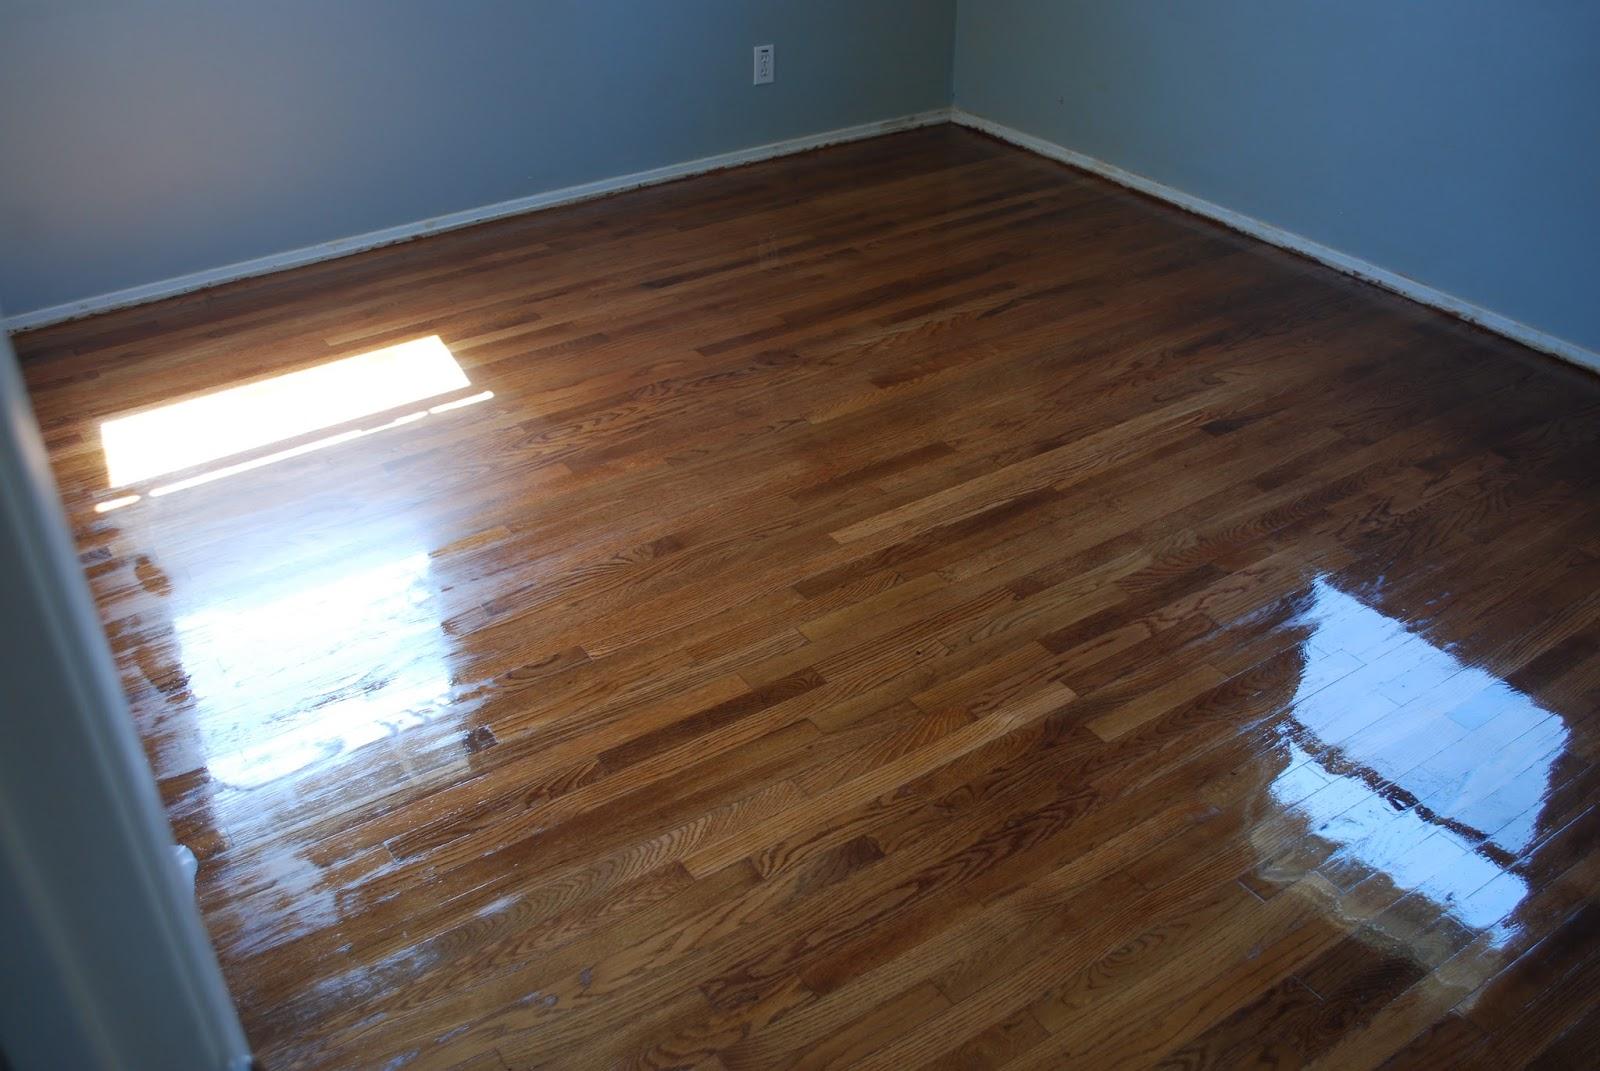 Kraken crafts refinished hardwood floors for Hardwood floors too shiny